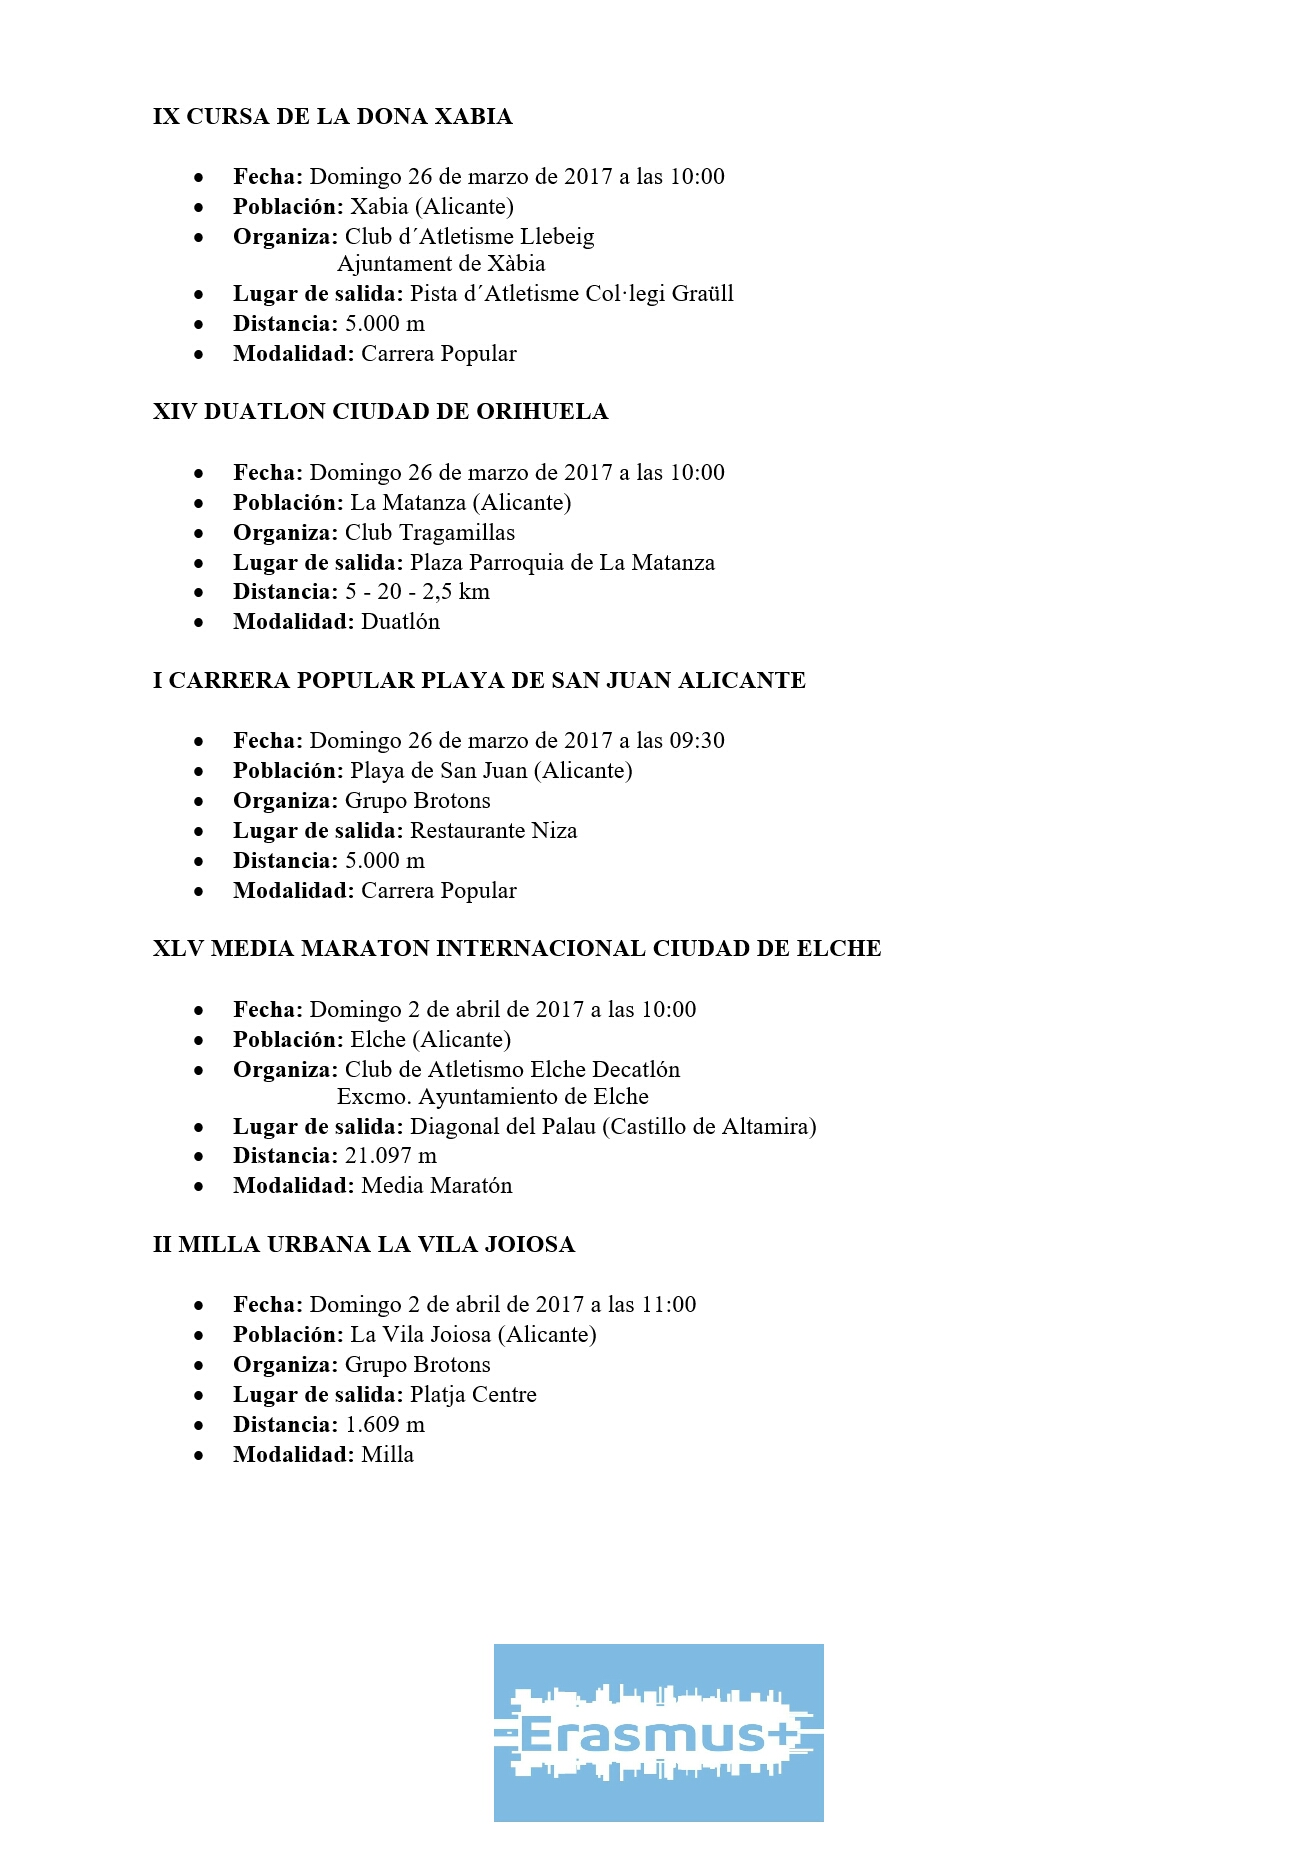 Carreras de 19 – 2 abril (2)